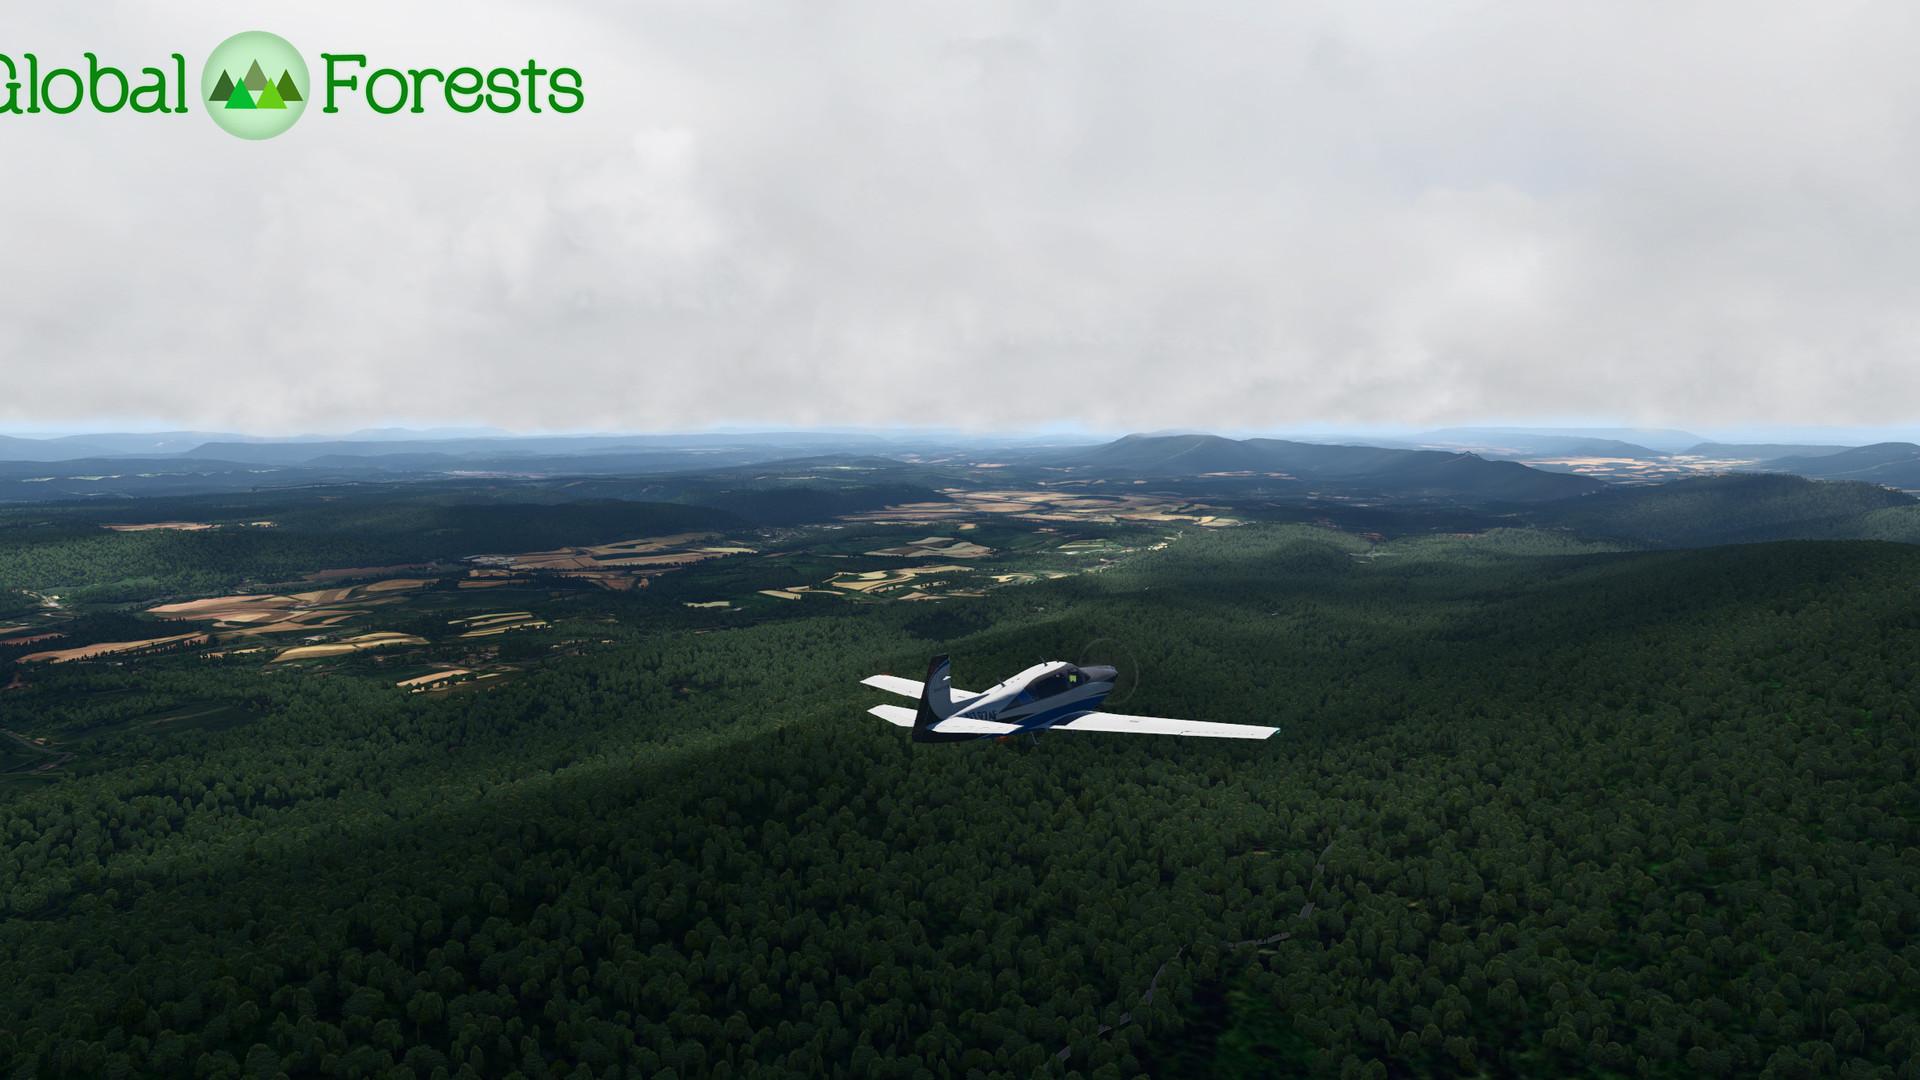 Global_Forests_USA4.jpg